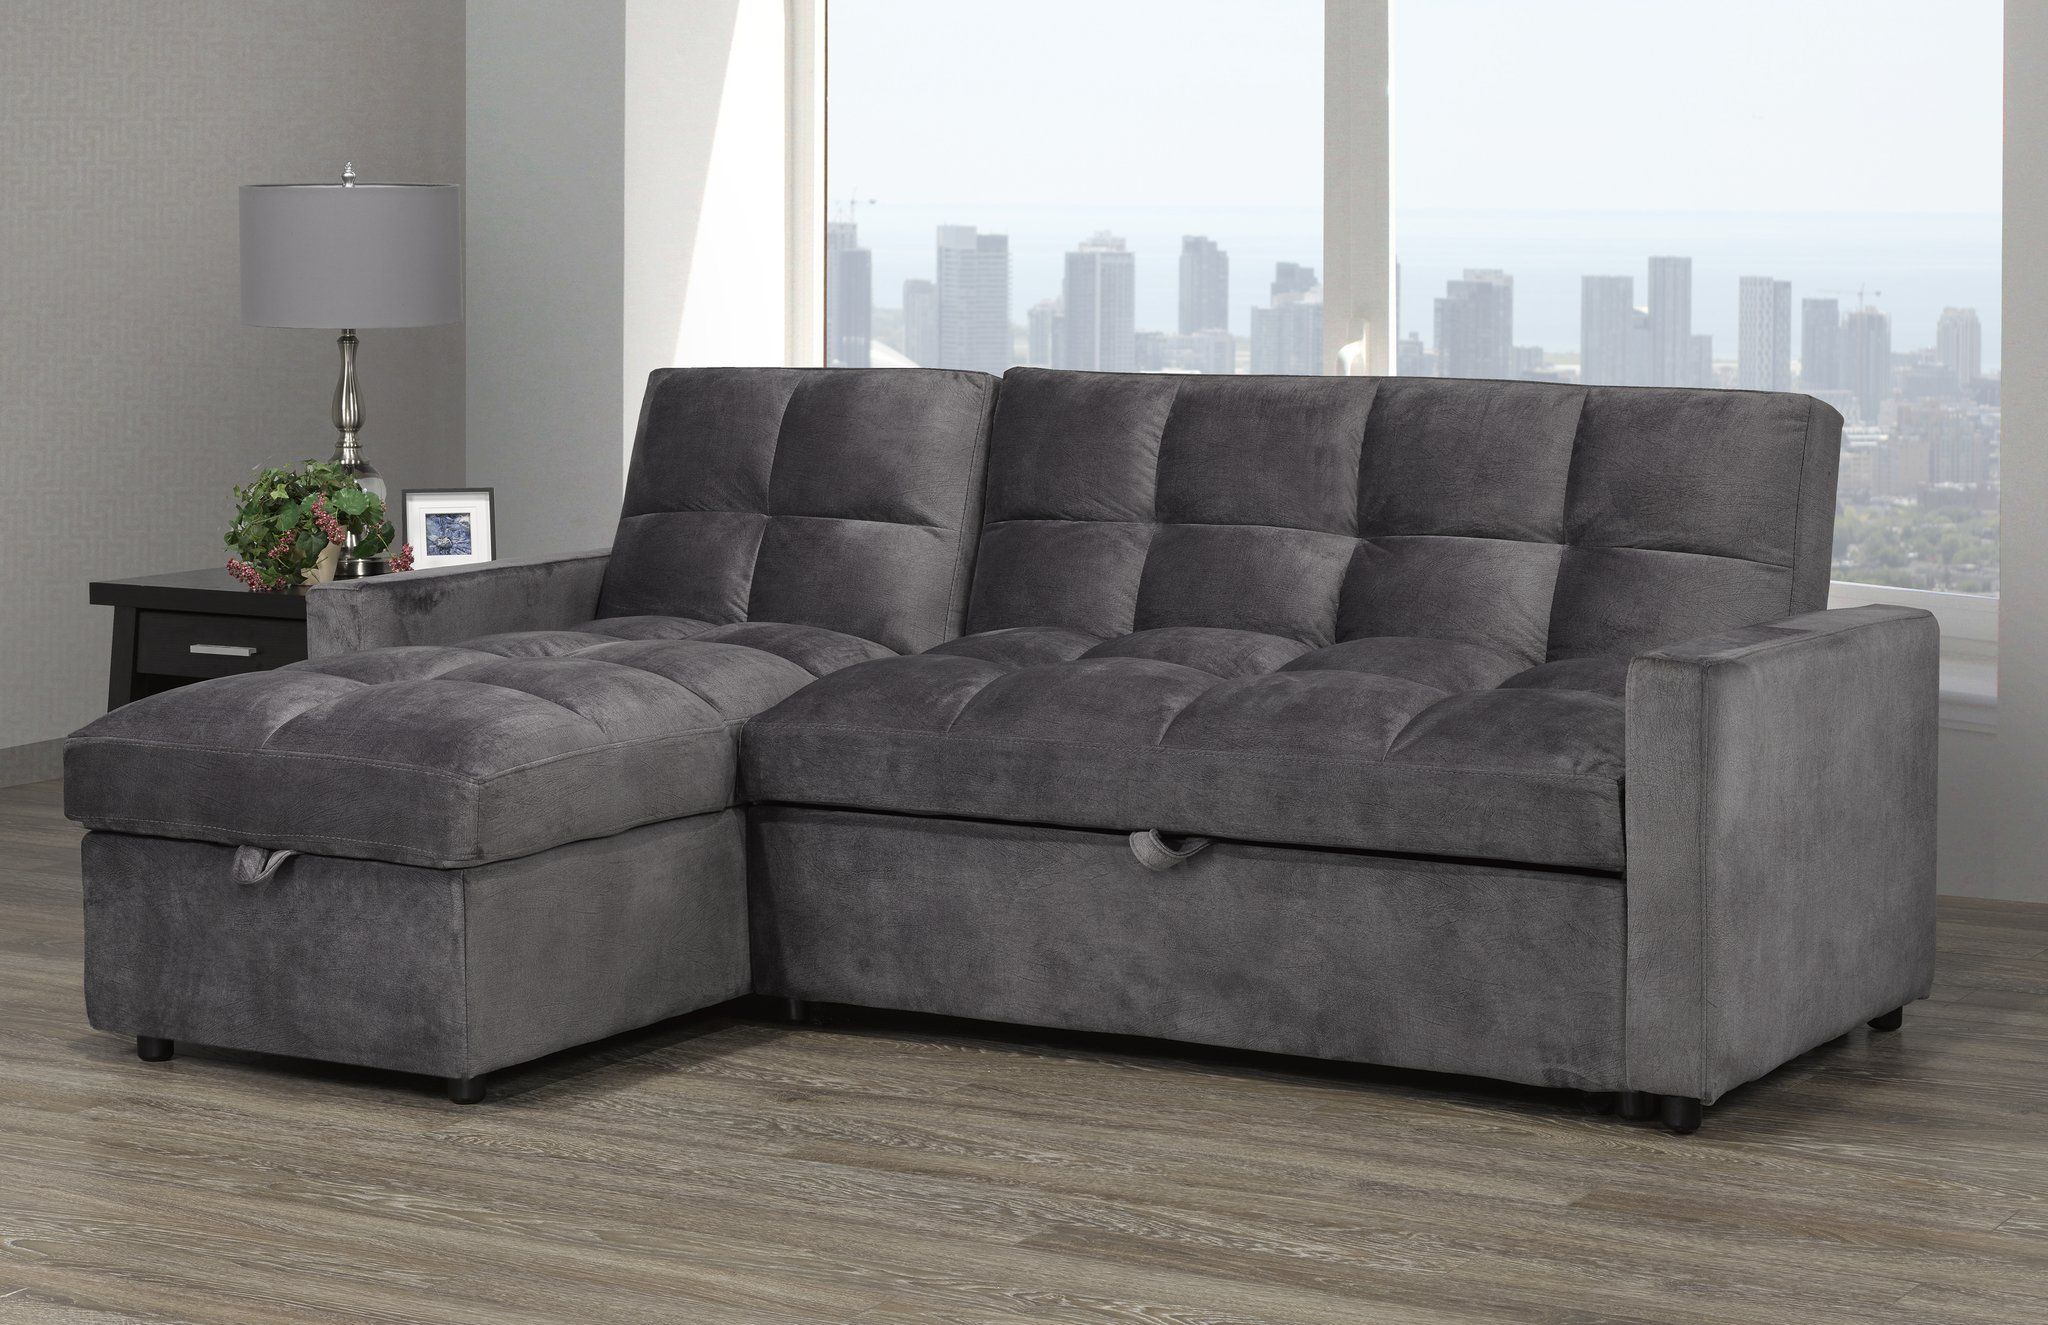 Jayden Sleeper Sectional Grey Velvet Candace And Basil Furniture Candace Basil Furniture In 2020 Storage Chaise Sleeper Sectional Sectional